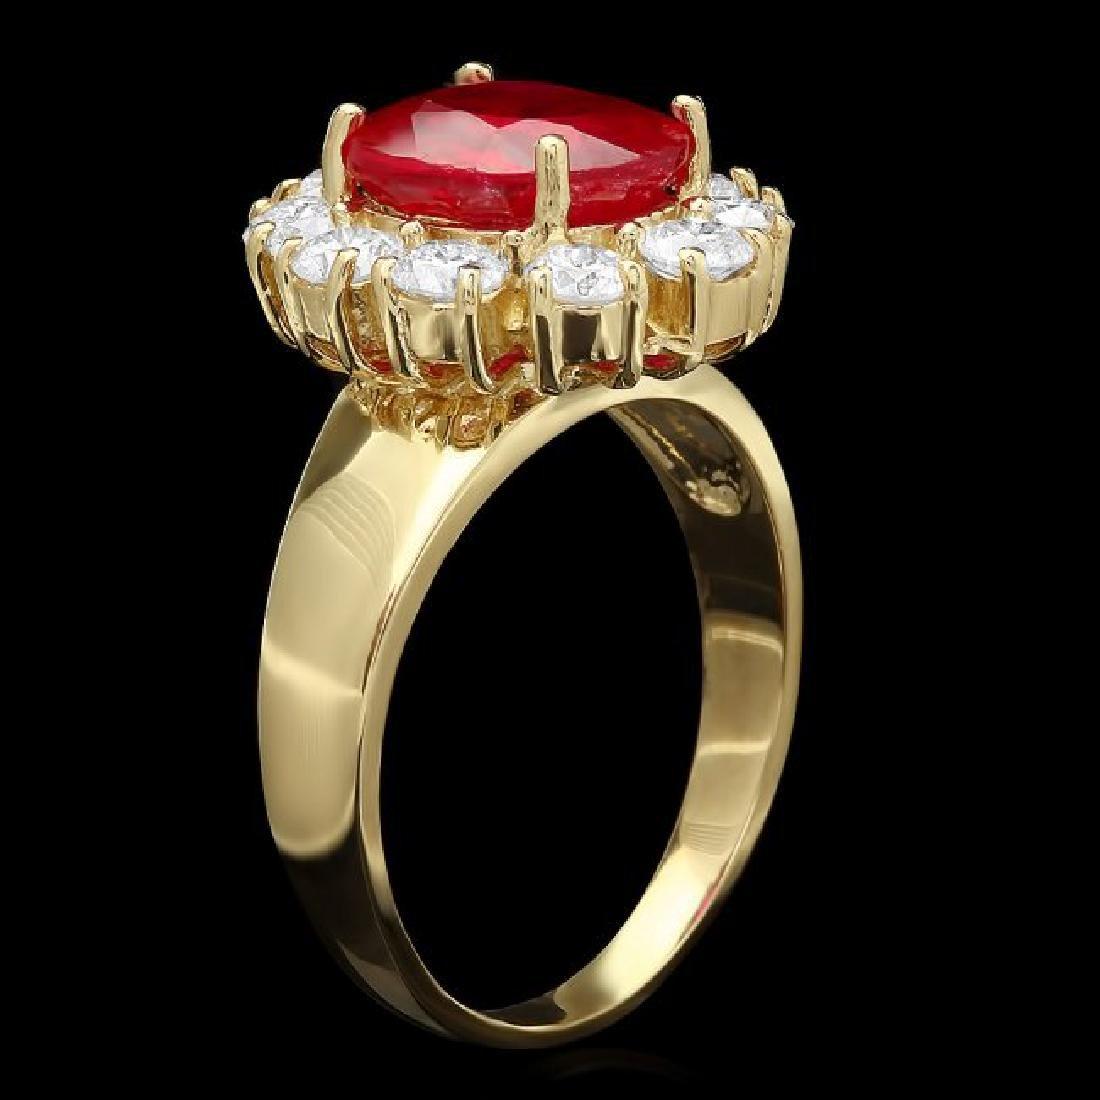 14k Yellow Gold 3.50ct Ruby 1.30ct Diamond Ring - 2